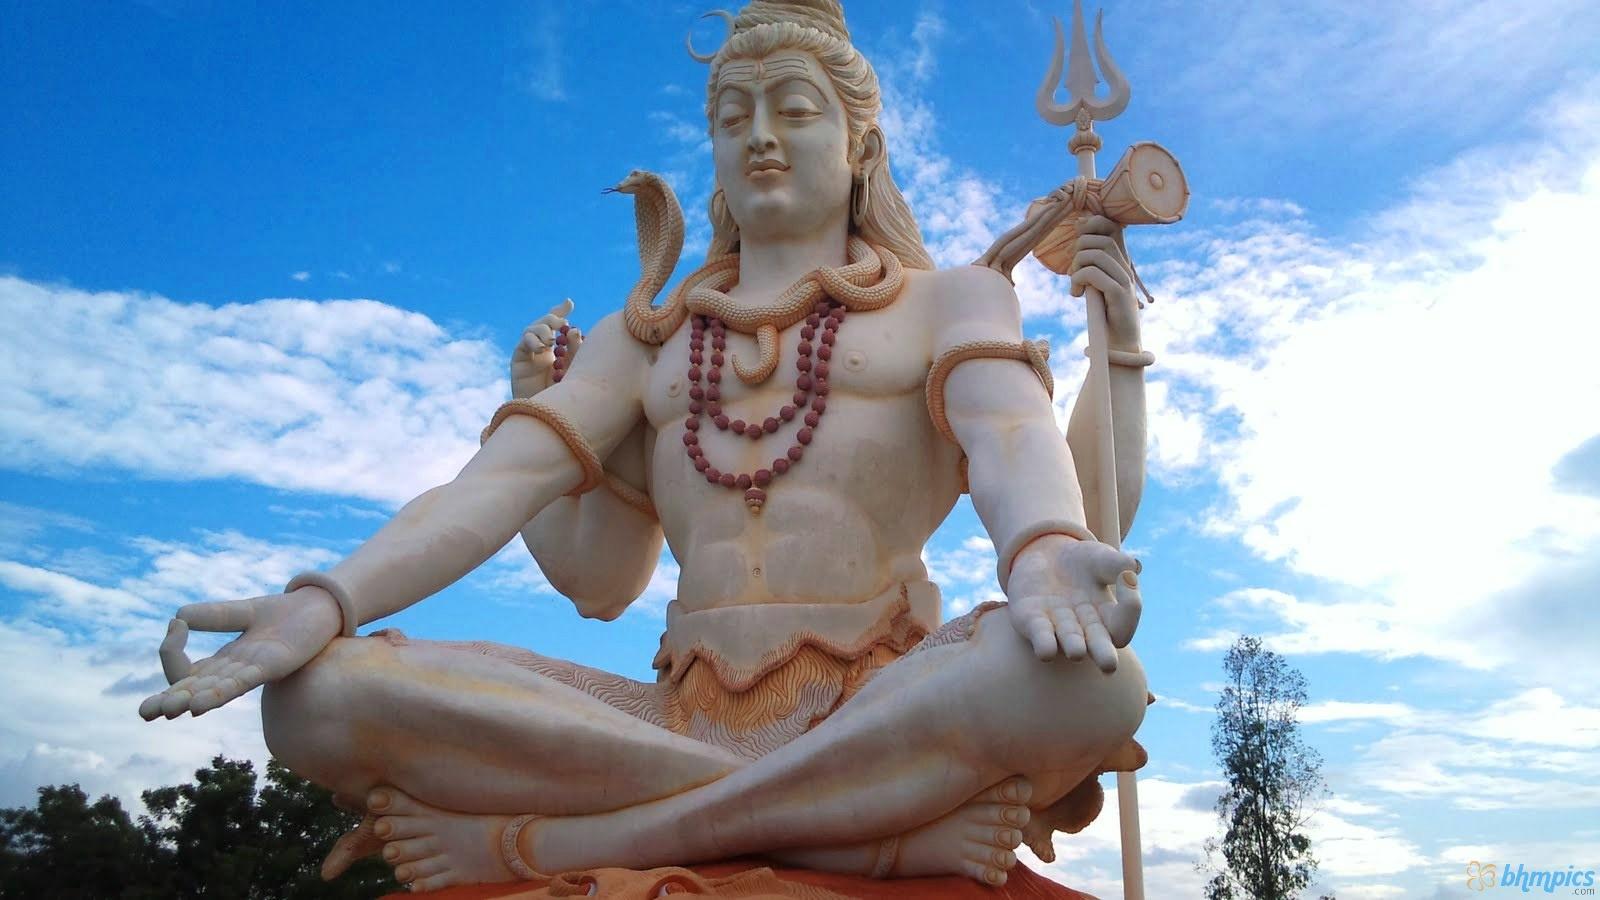 Lord Shiva As Ardhanareeswara Beautiful Hd Wallpapers For: Lord Shiva HD Wallpapers